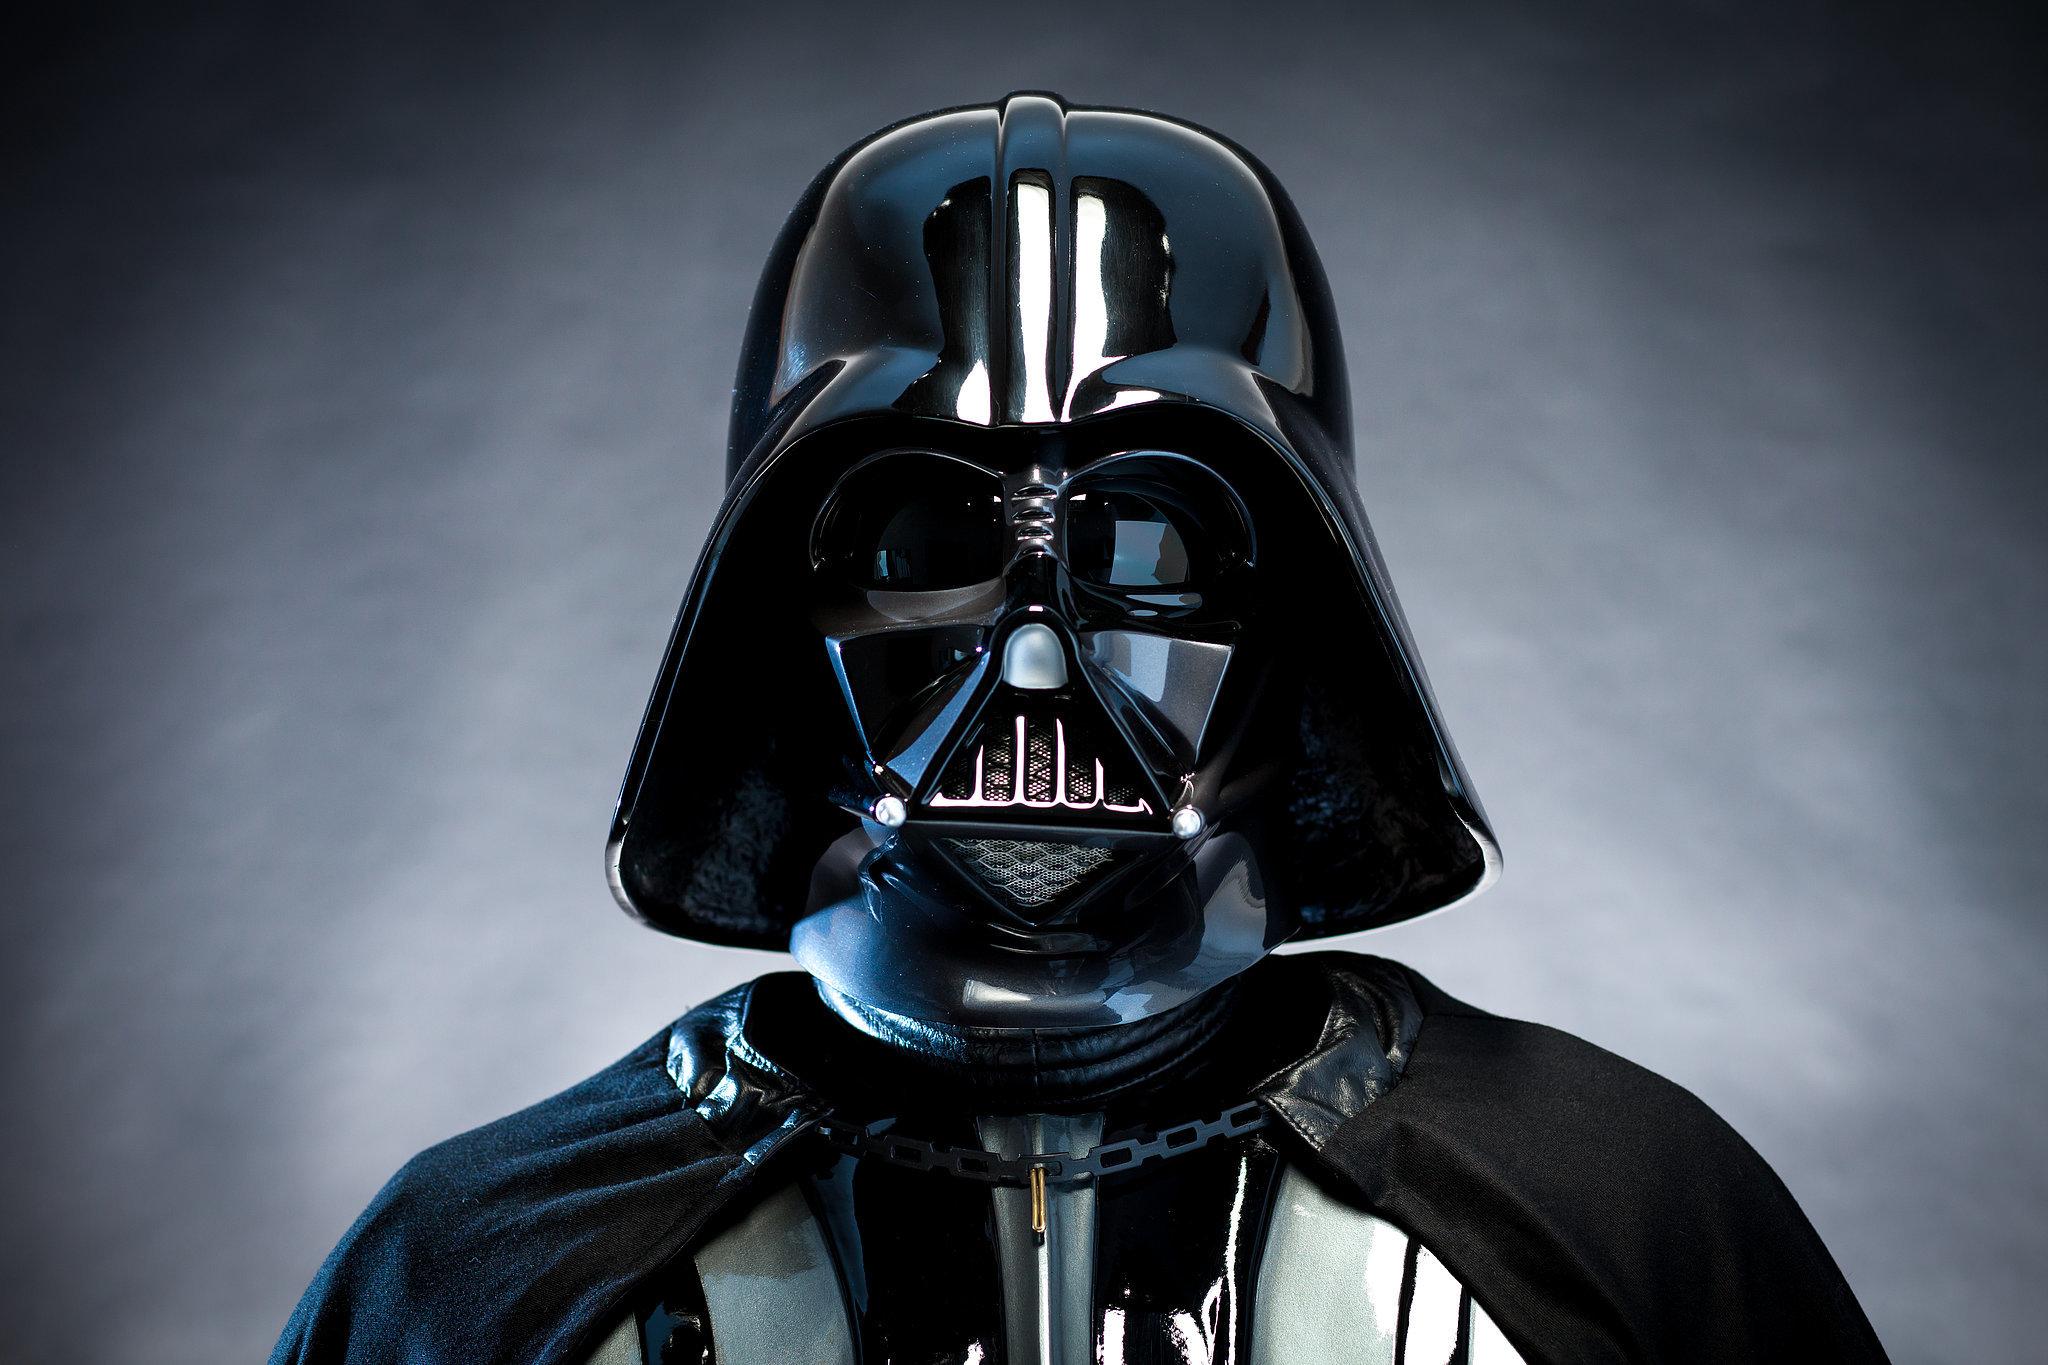 Darth Vader Fotoğrafları (10)